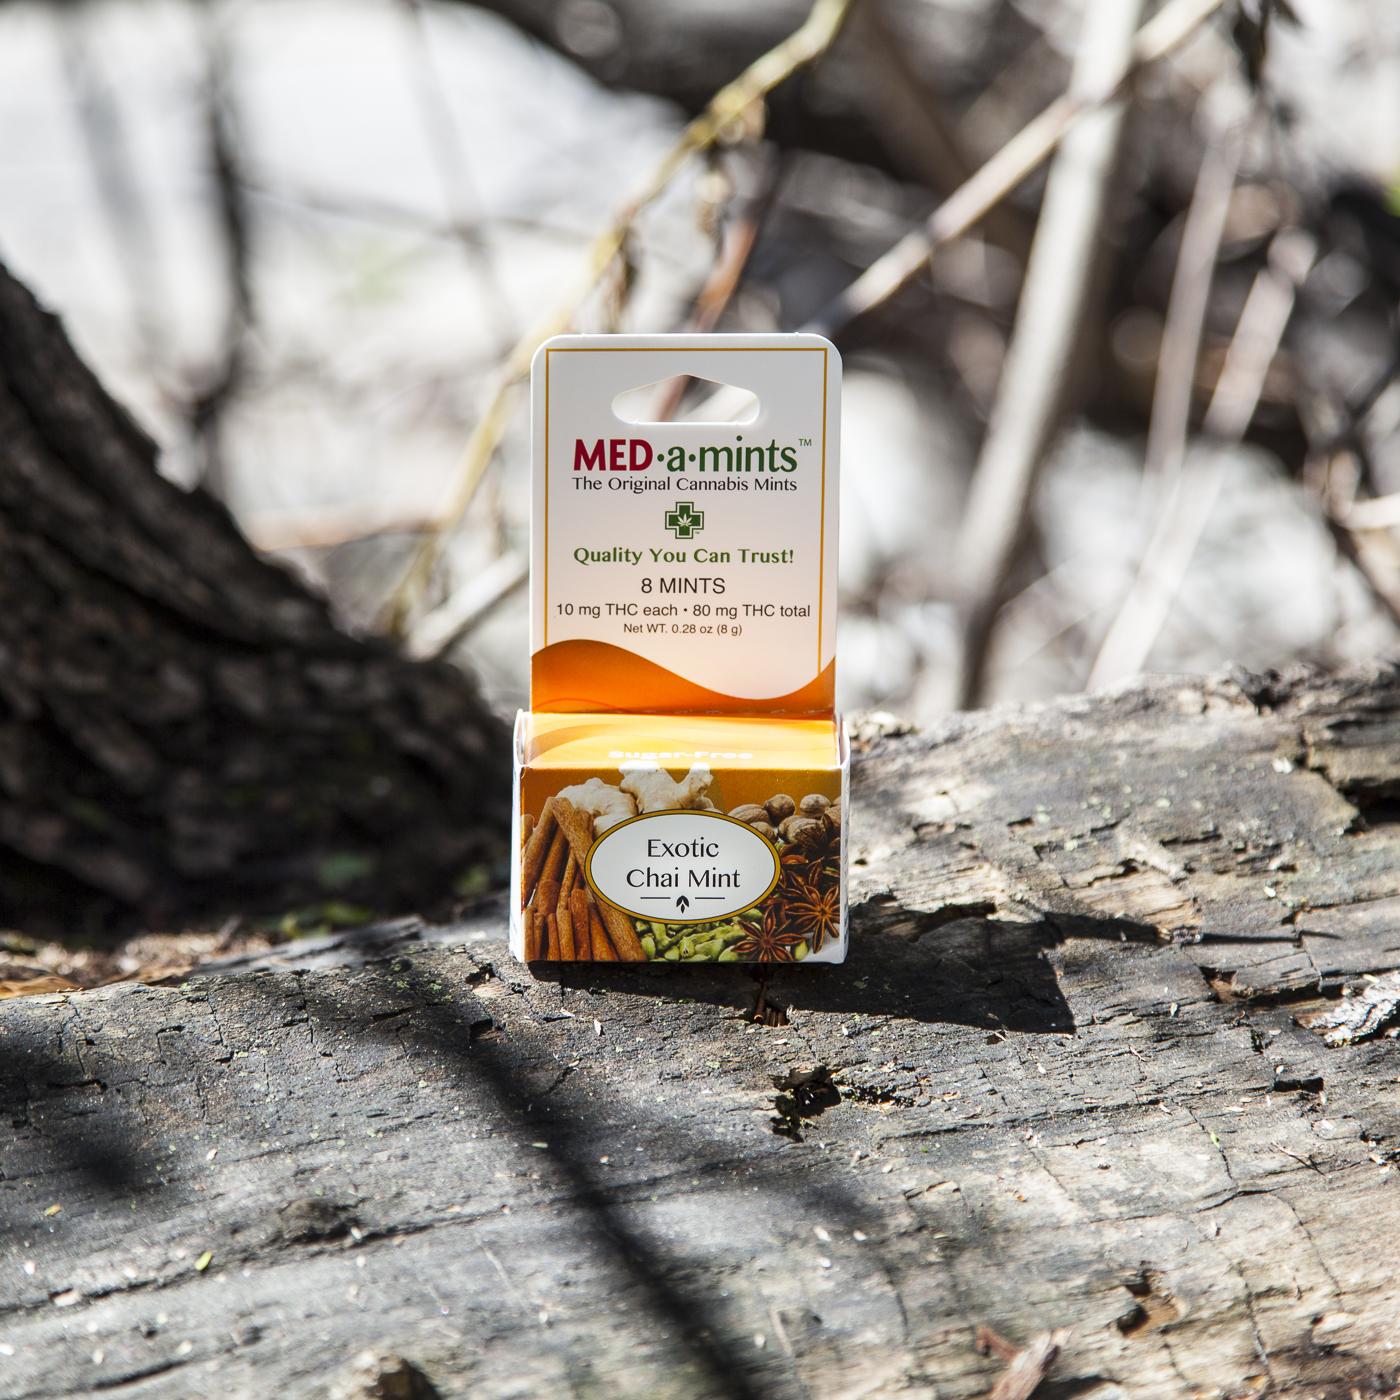 medamints-potent-thc-cannabis-marijuana-mints-037